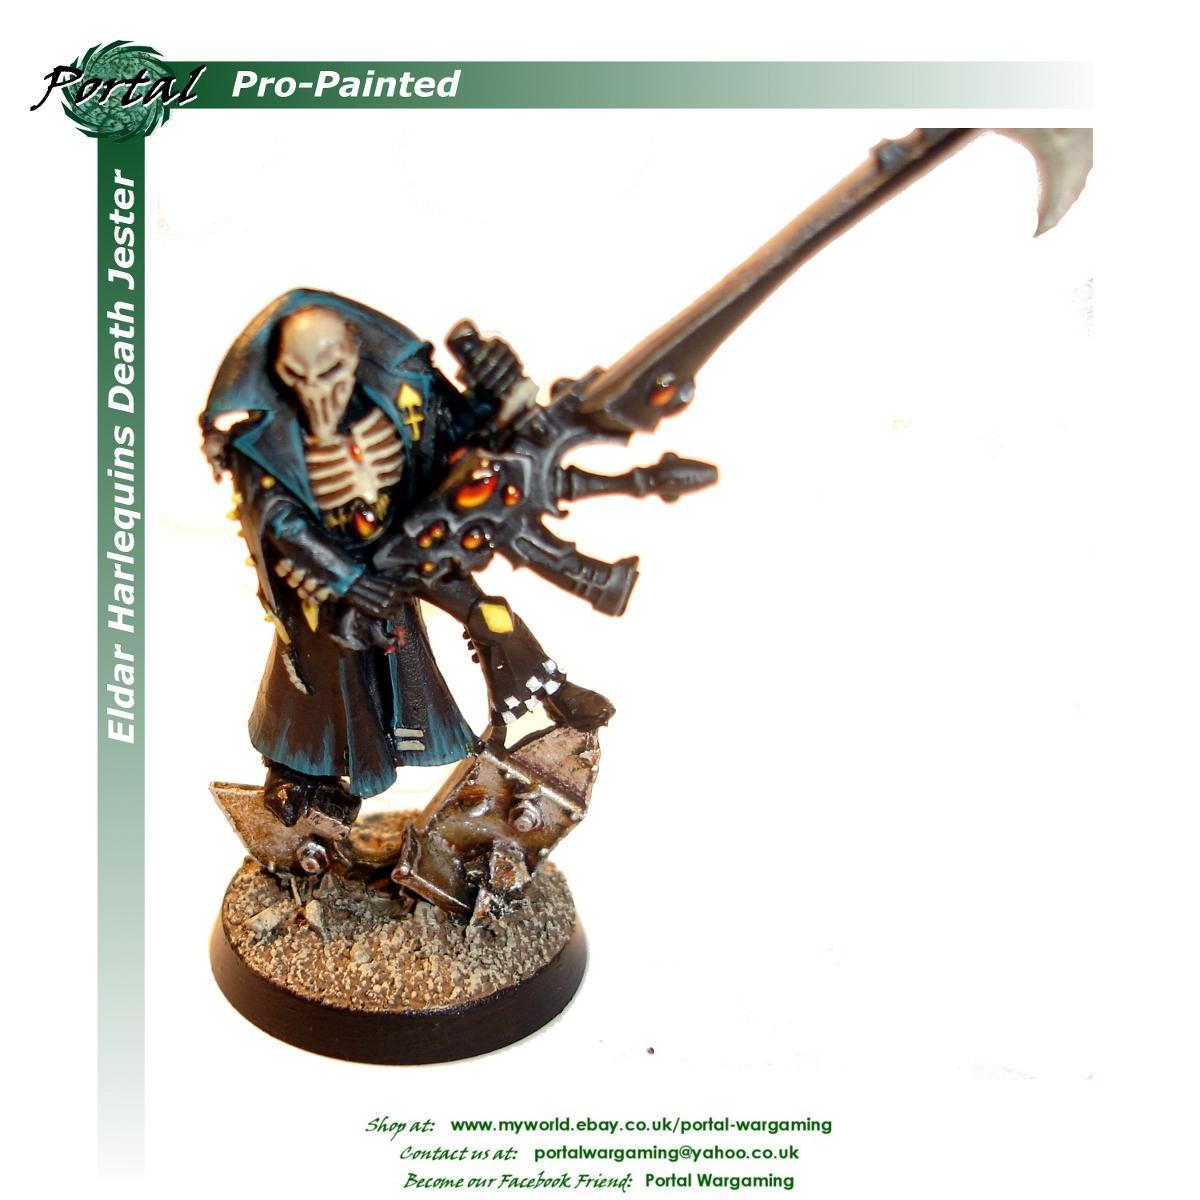 Eldar, Harlequins, Pro-painted, Warhammer 40,000